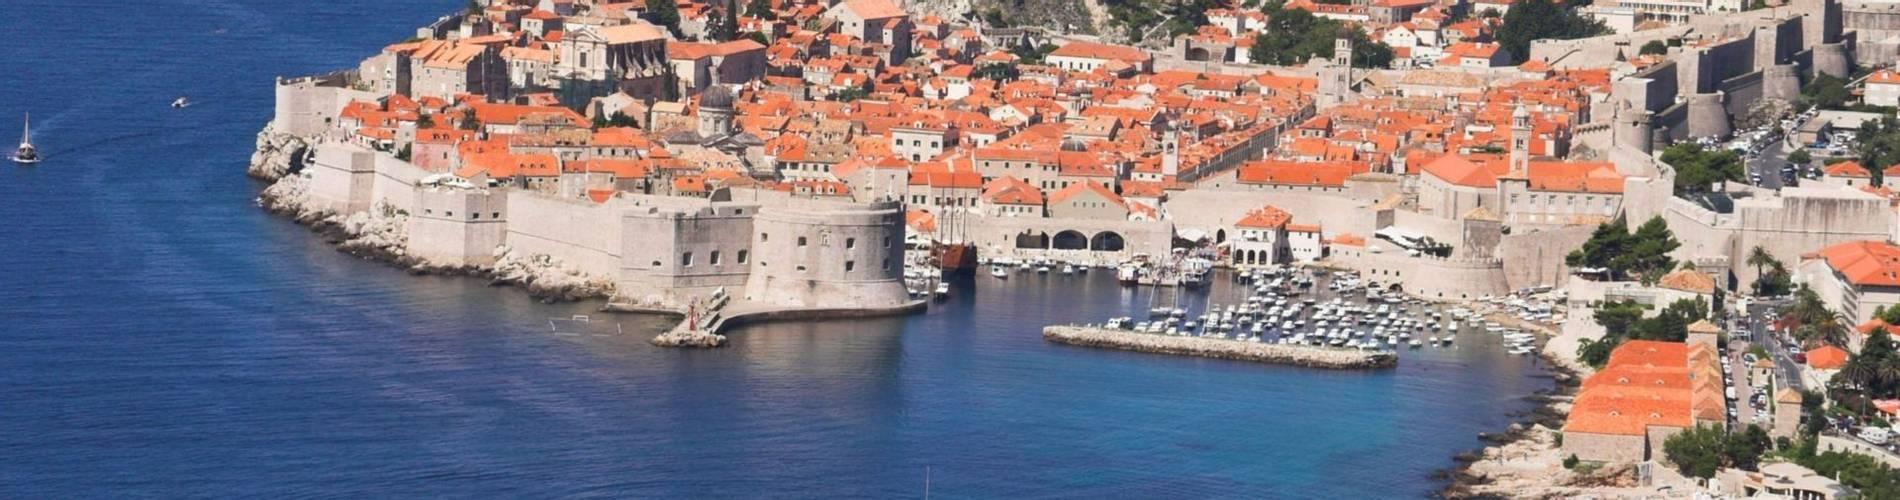 Adriatic Odyssey Dubrovnik, Croatia.jpg